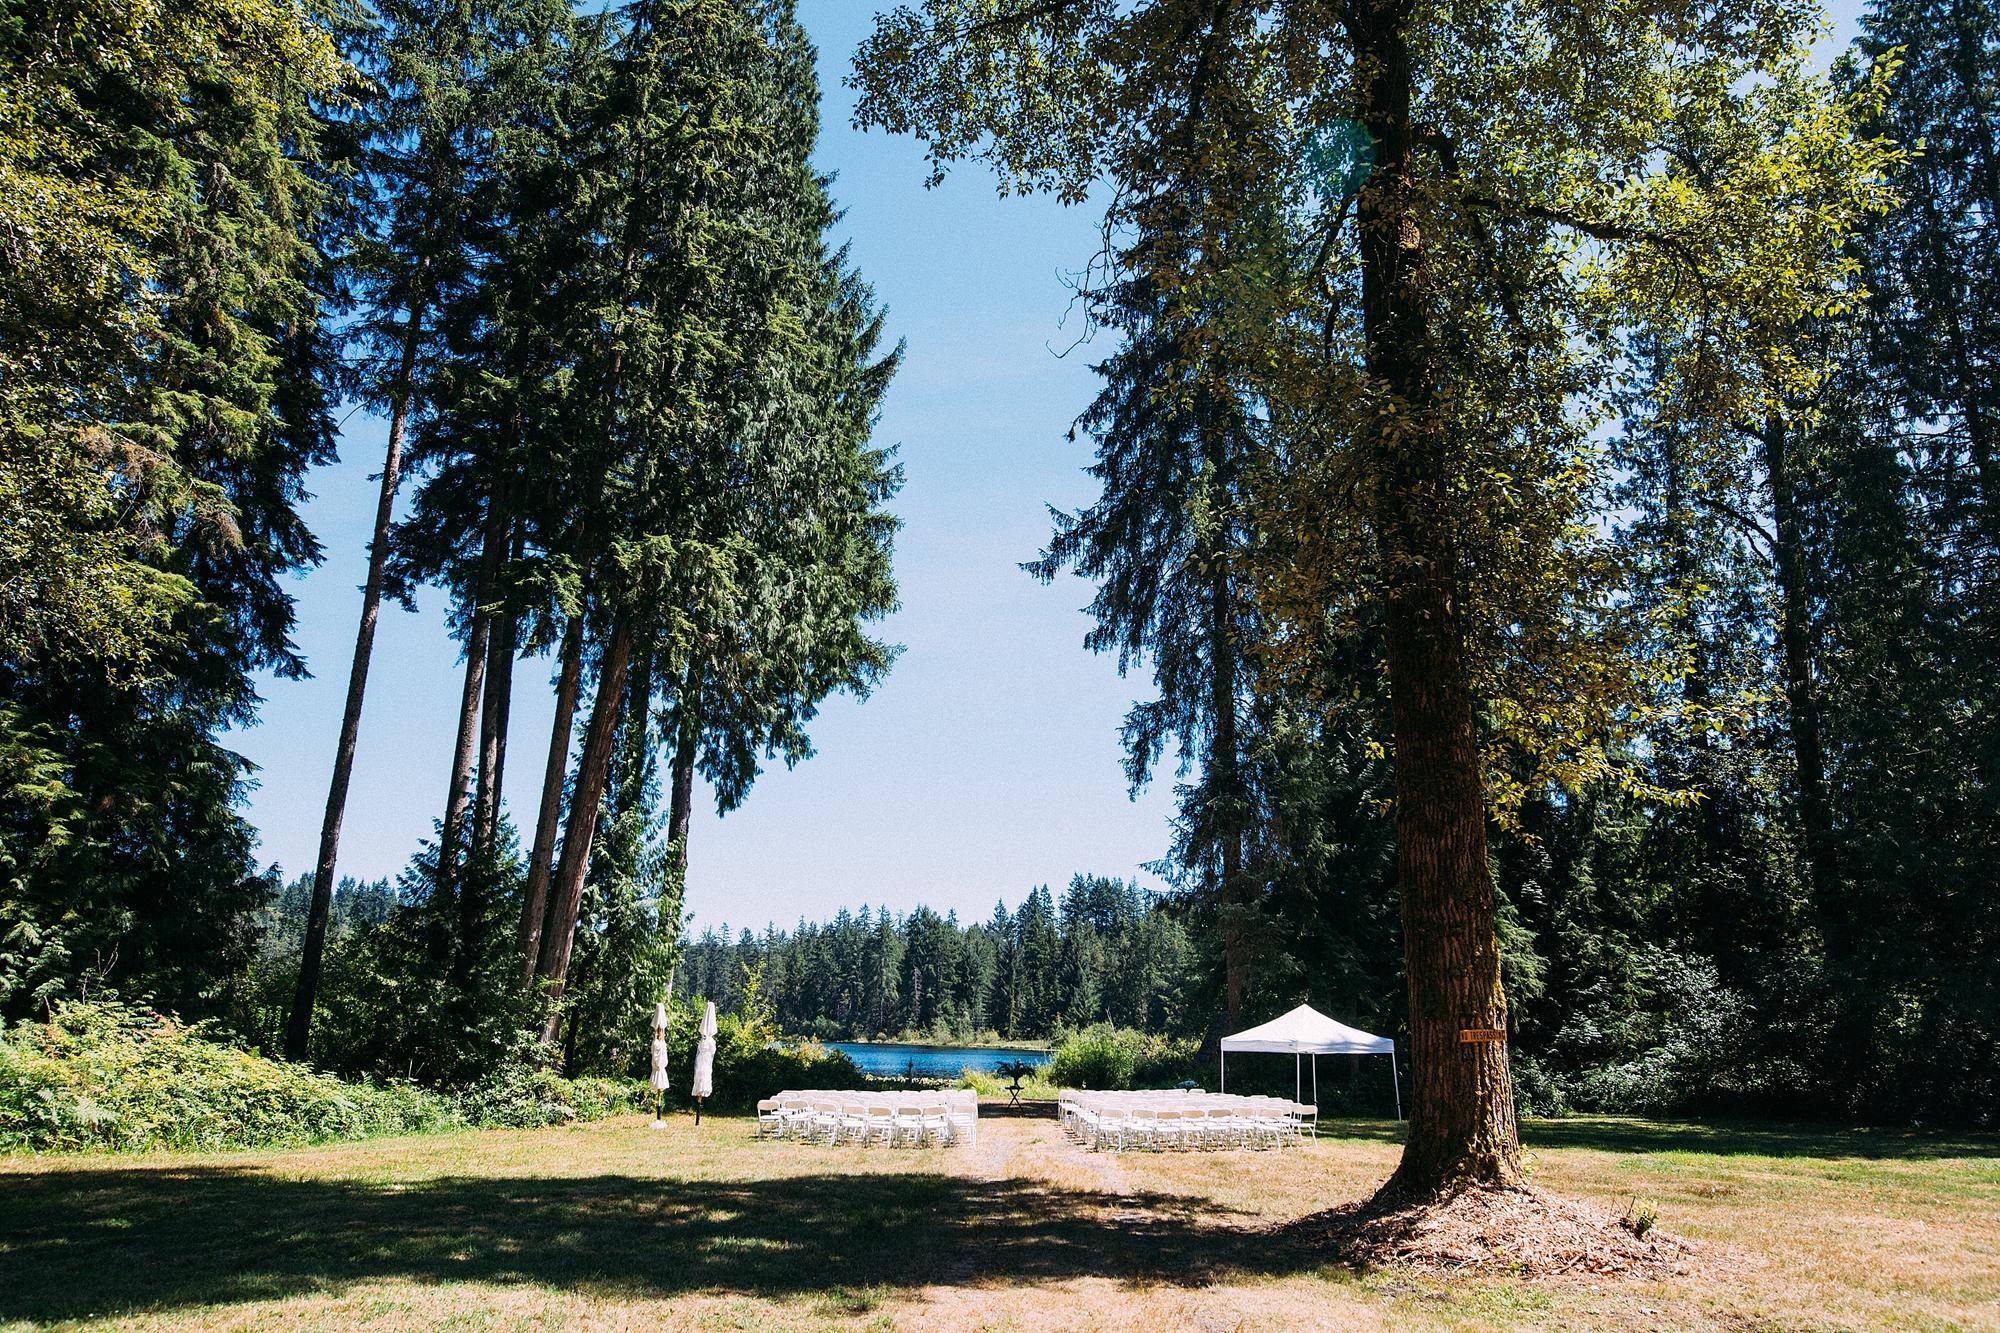 ashley vos photography seattle area wedding photographer_0693.jpg